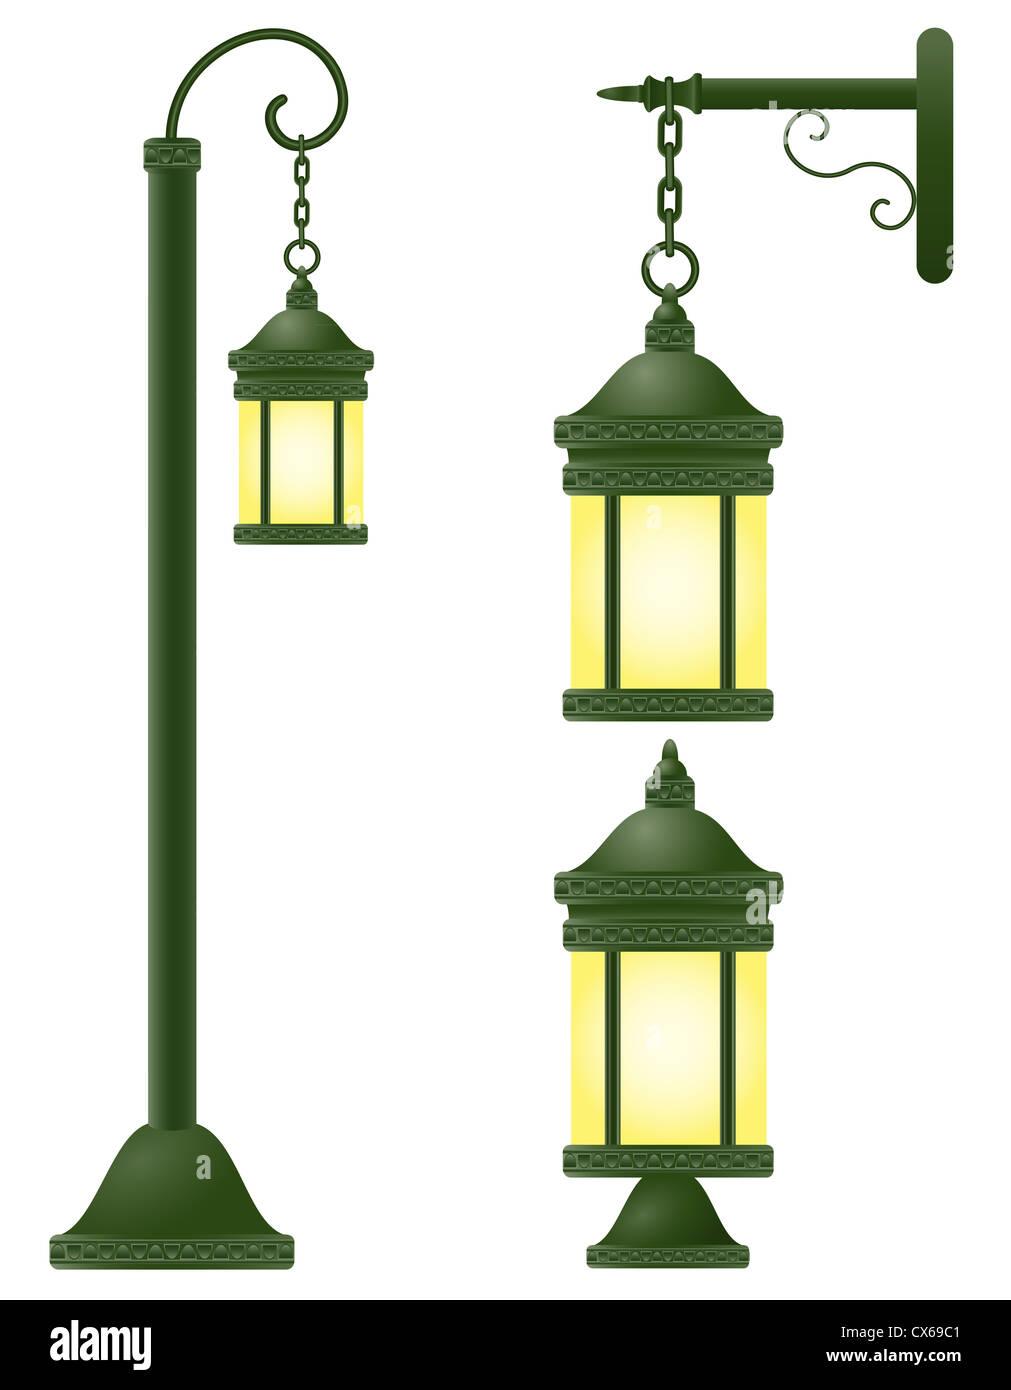 streetlight vector illustration isolated on white background Stock Photo